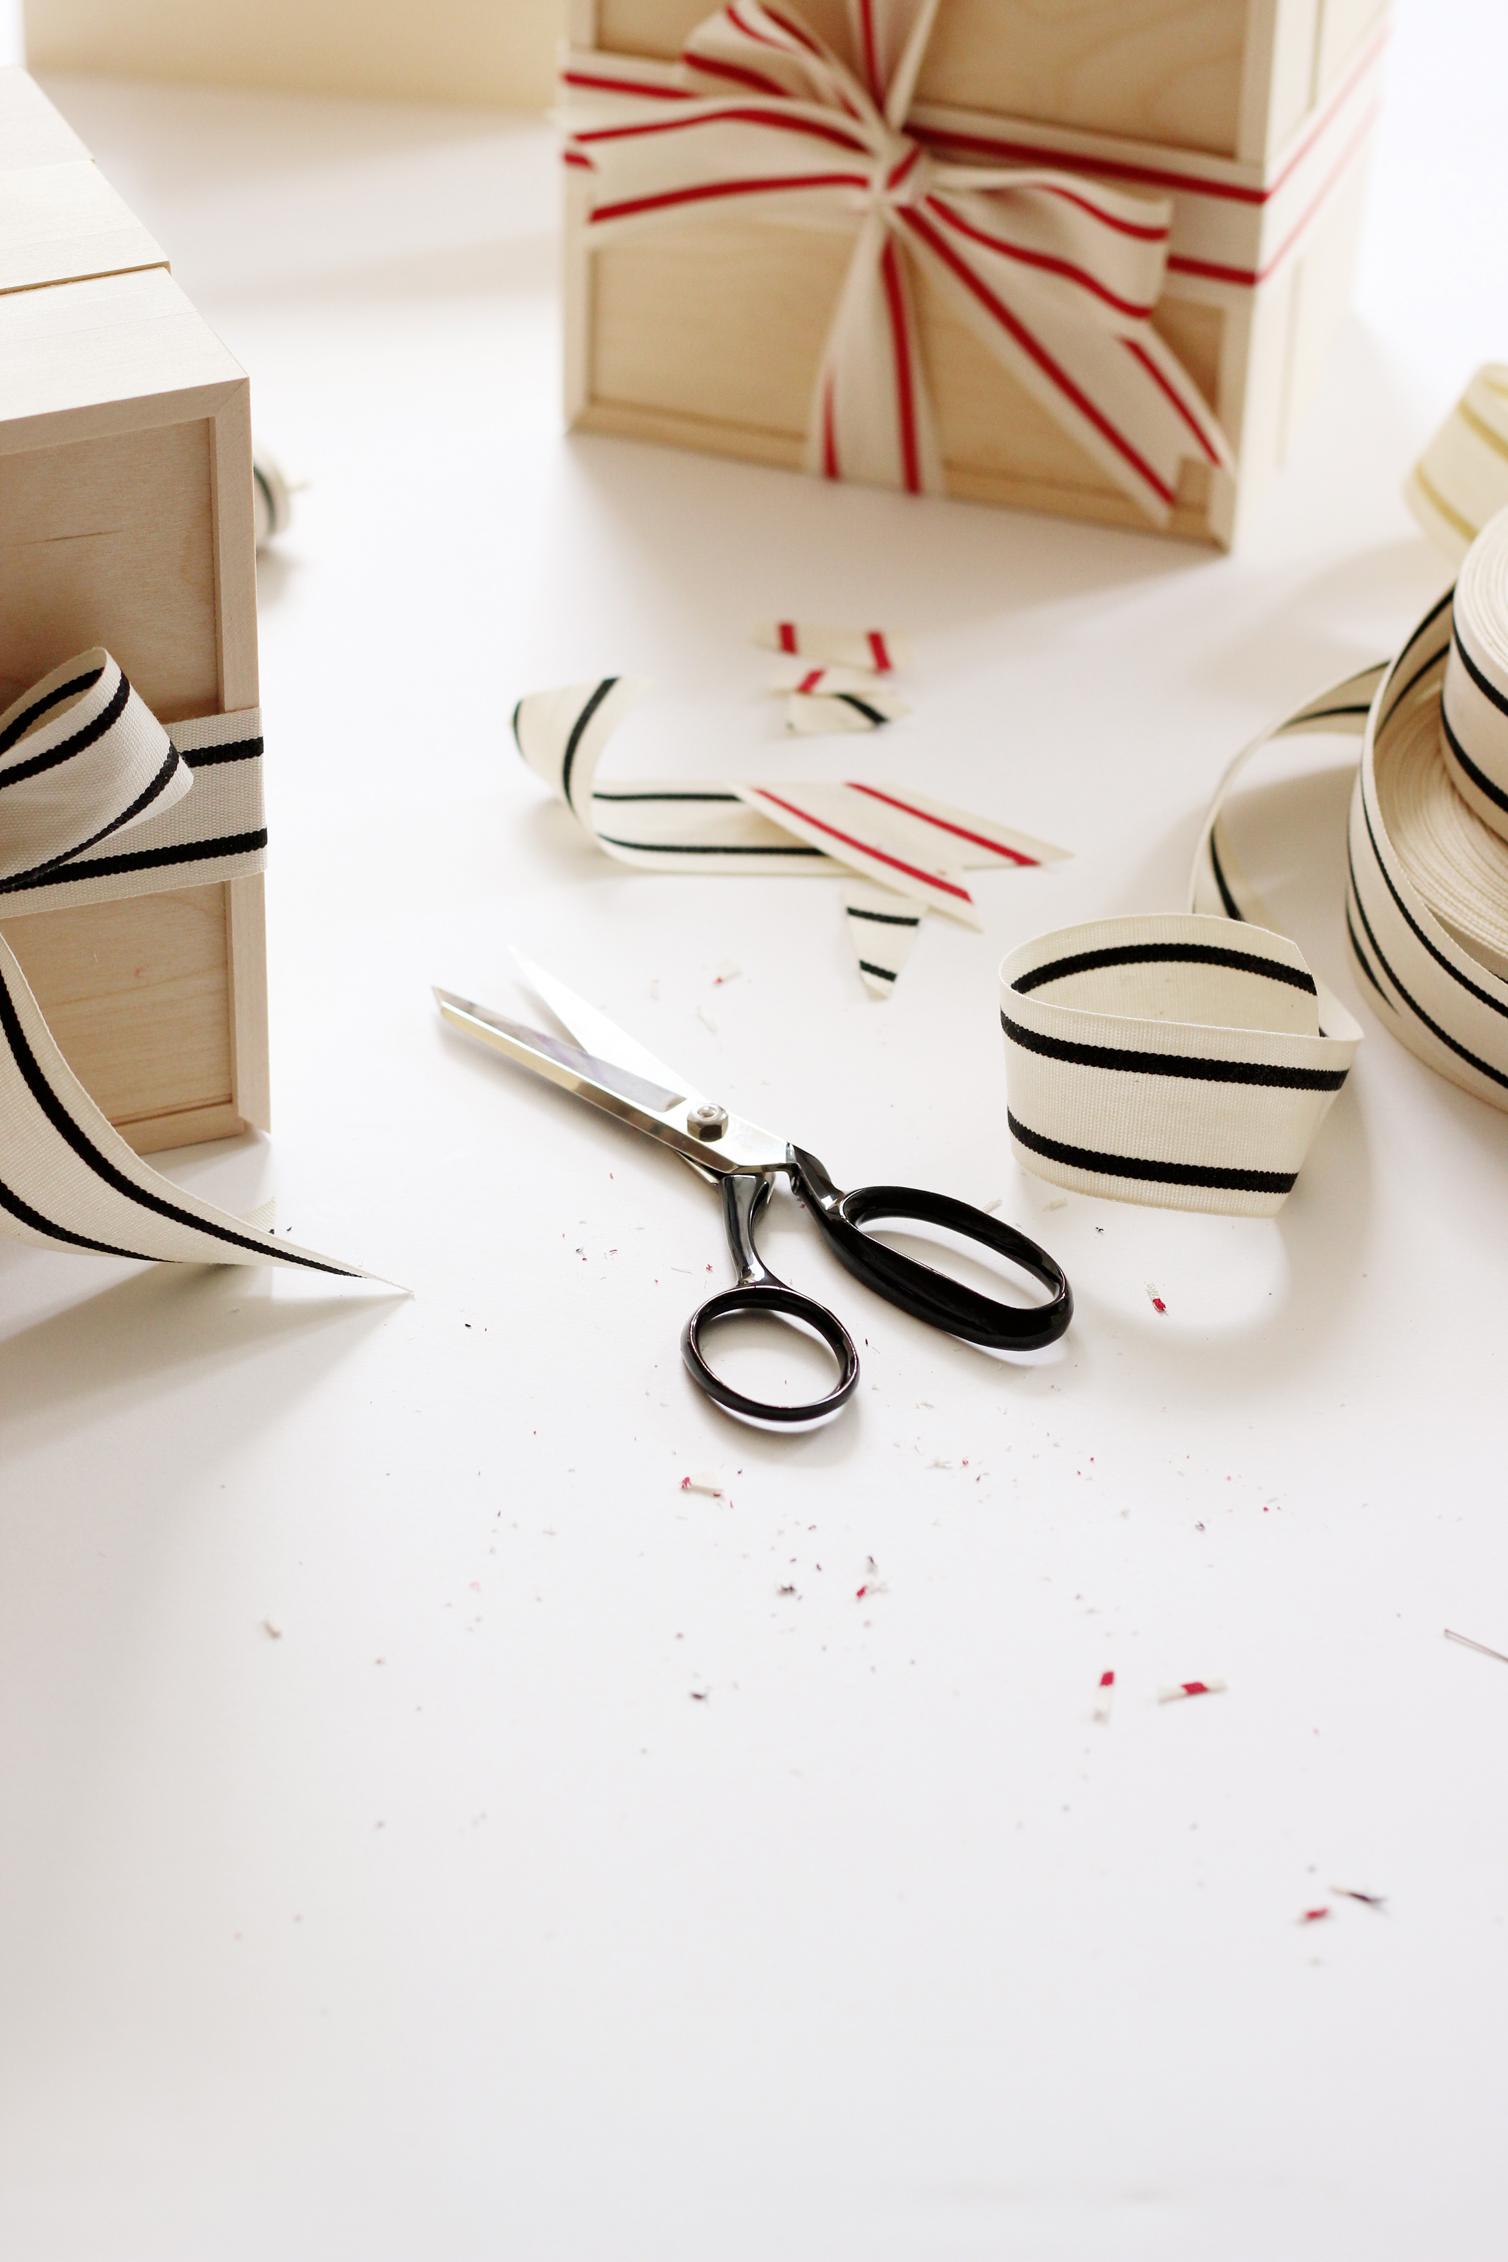 dressmaker shears - studio cartaW.jpg